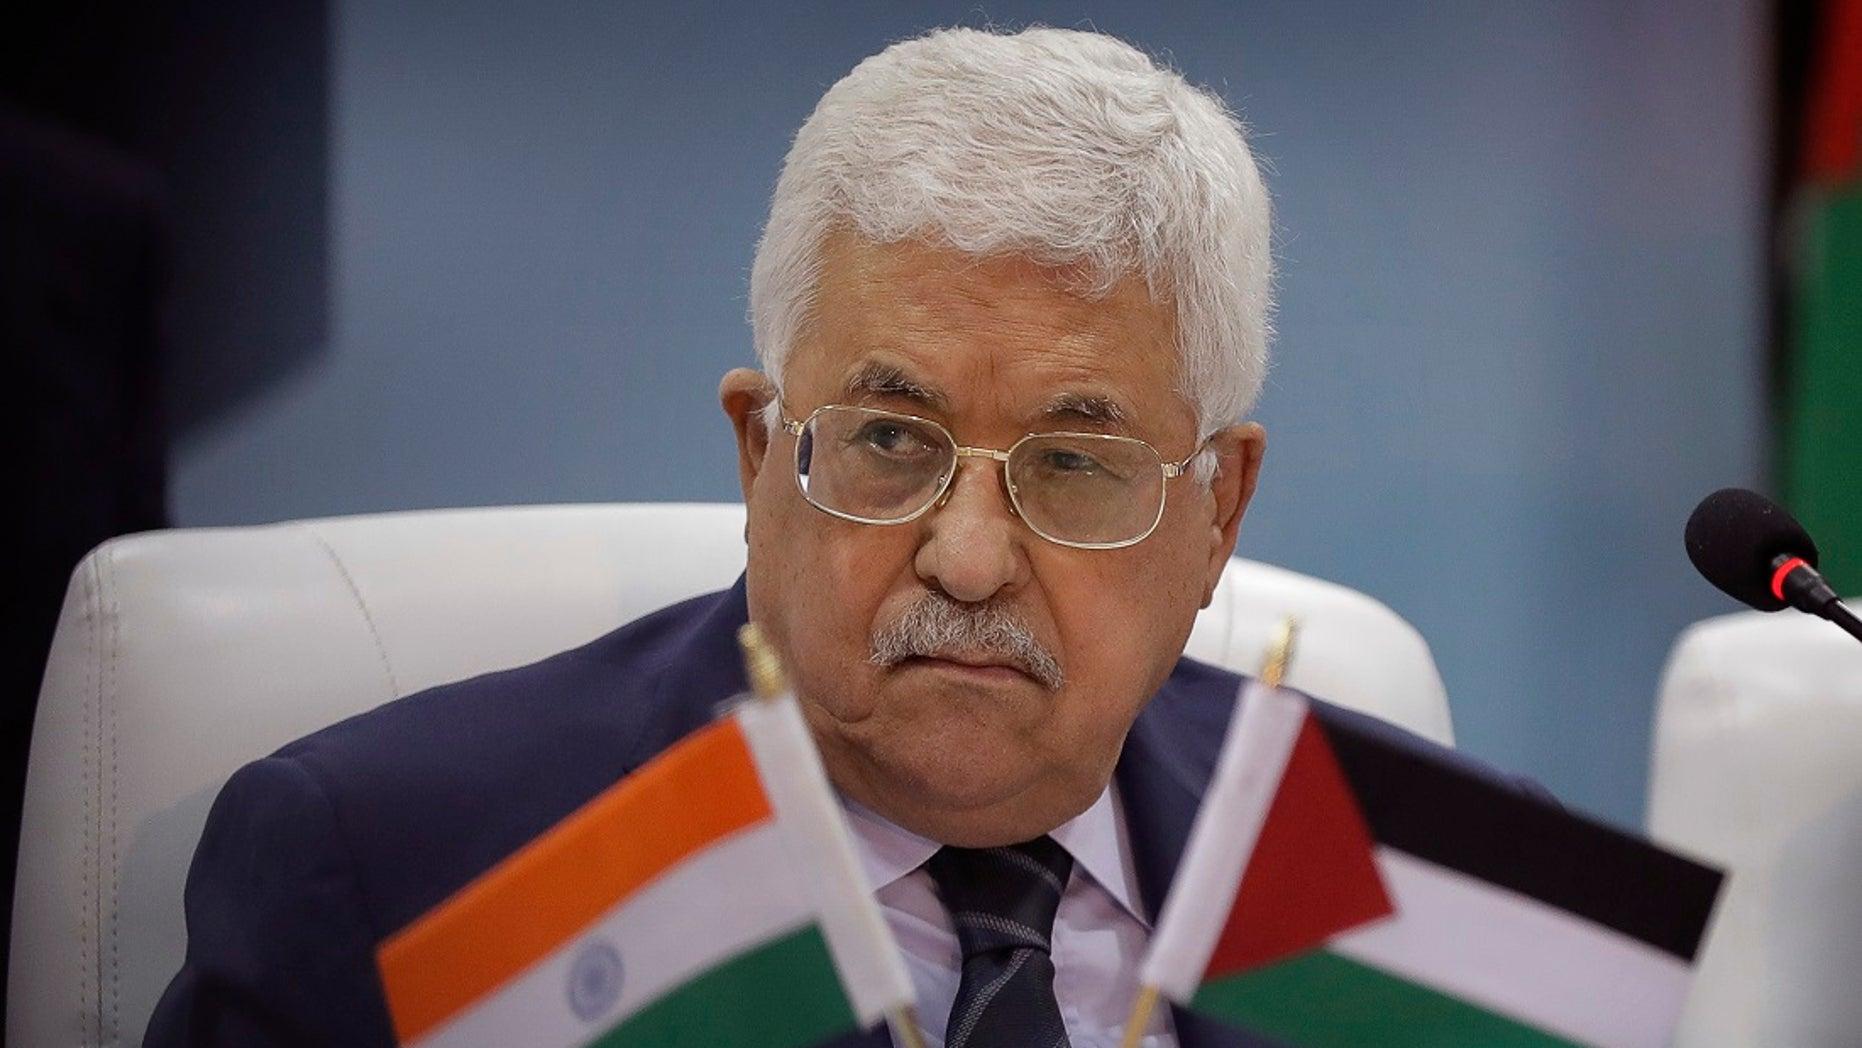 Palestinian President Mahmoud Abbas in New Delhi, India, Monday, May 15, 2017.